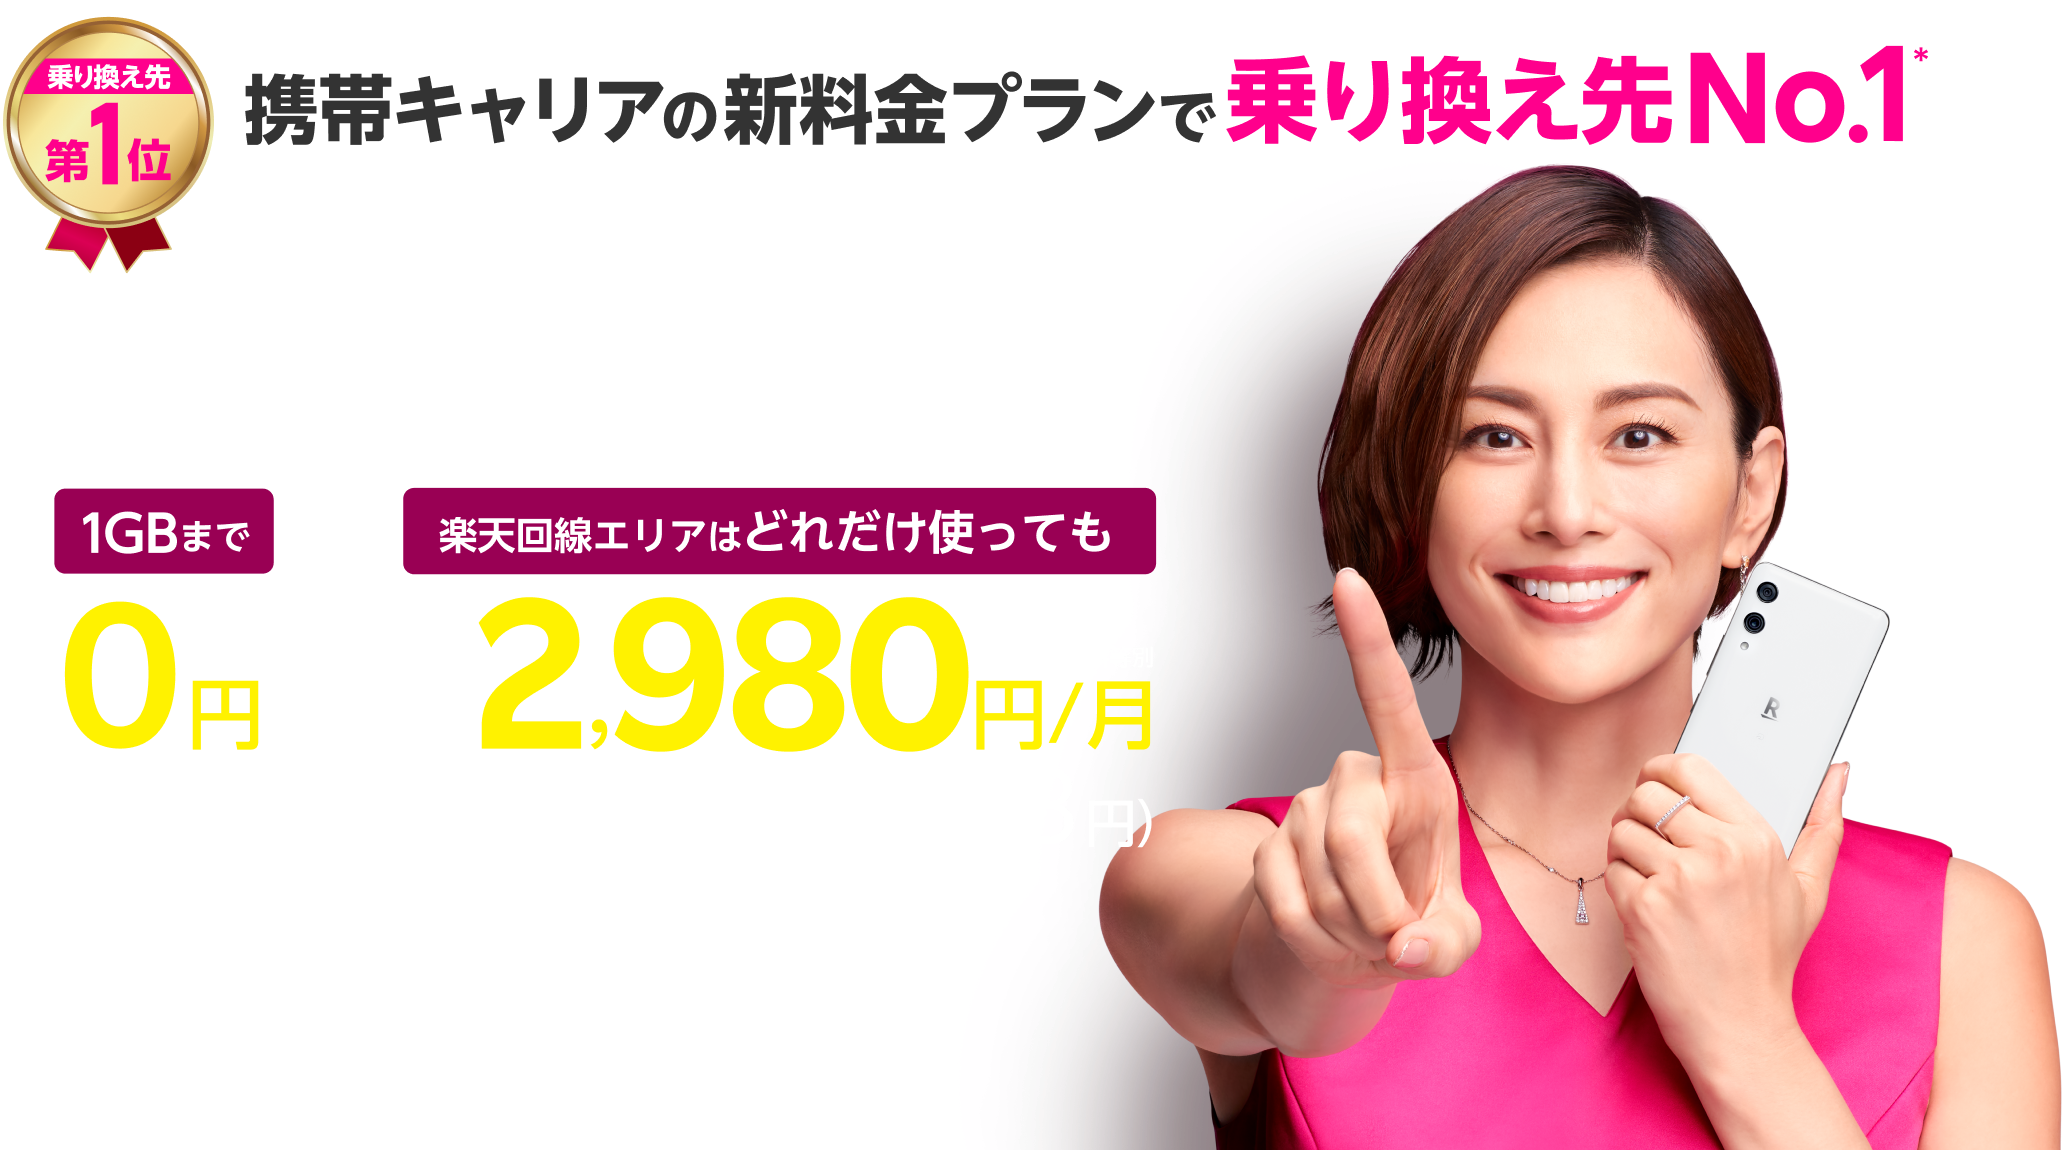 Rakuten UN-LIMIT2.0 1年無料(プラン料金2,980円/月)